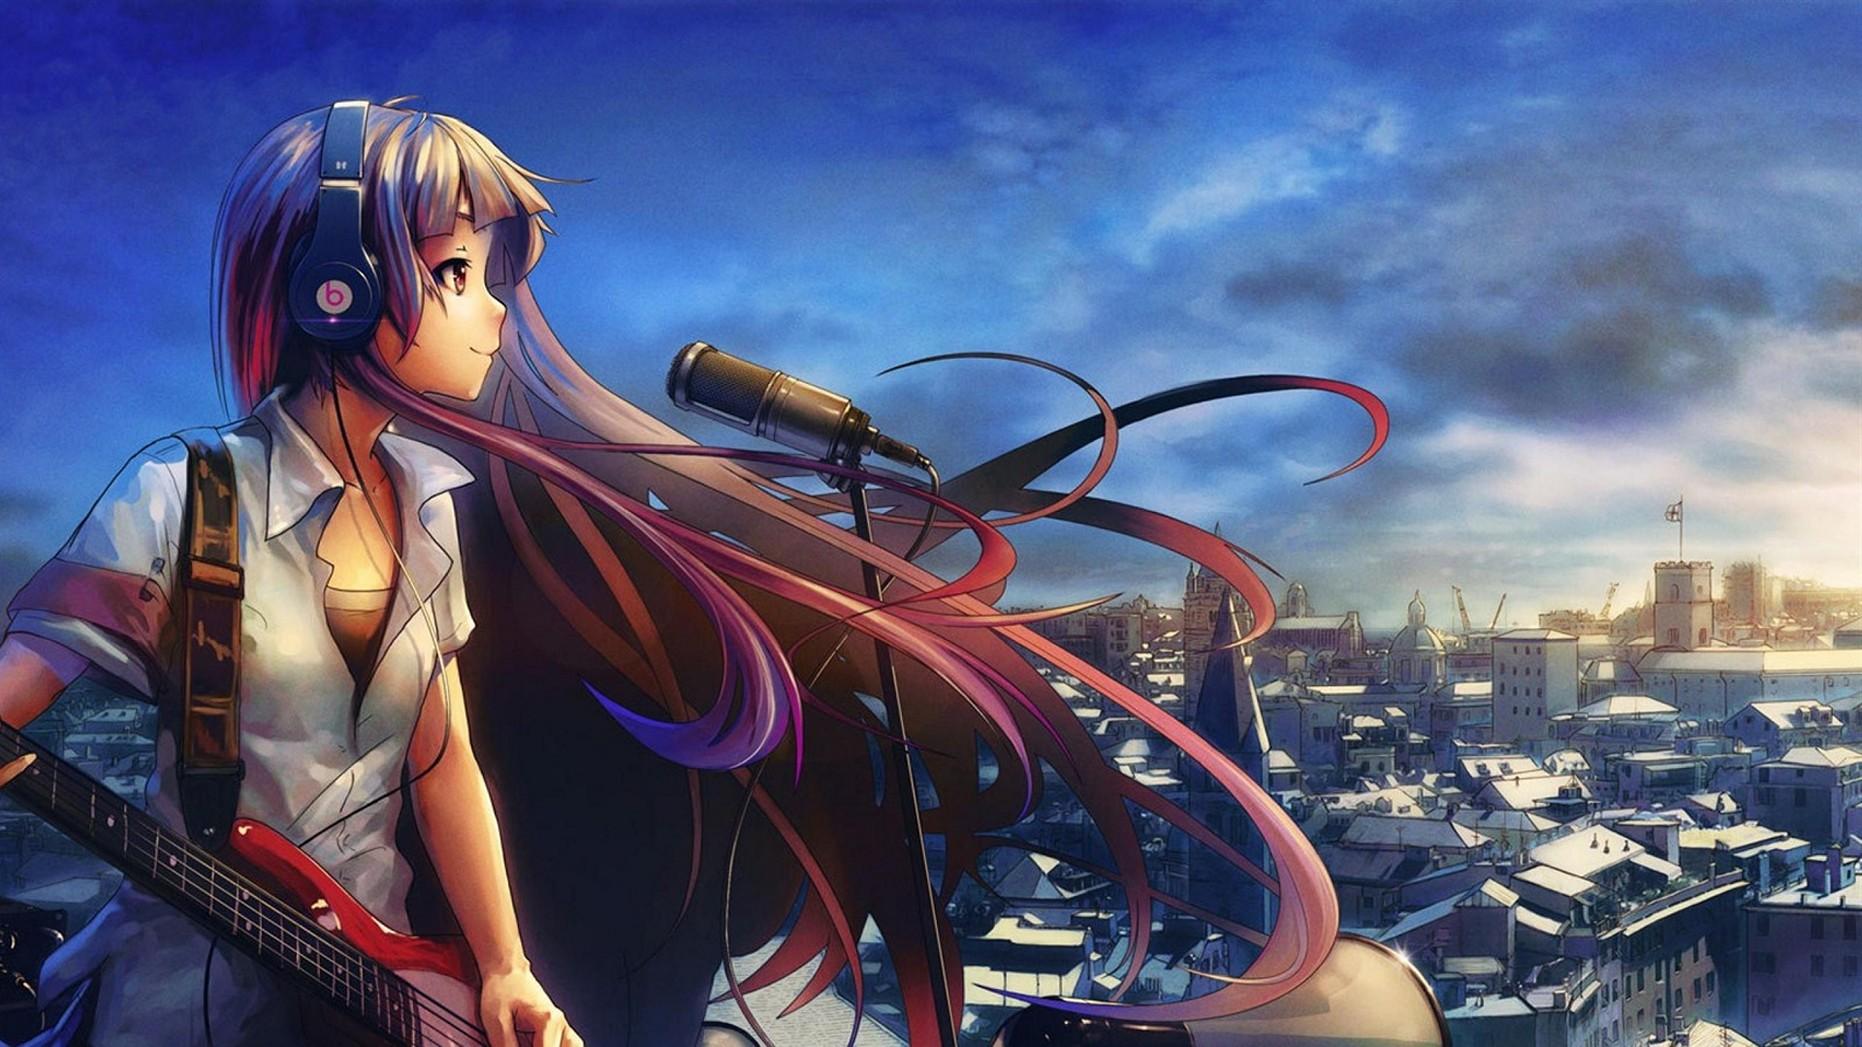 Cool anime wallpapers hd wallpapersafari - Anime wallpaper music ...